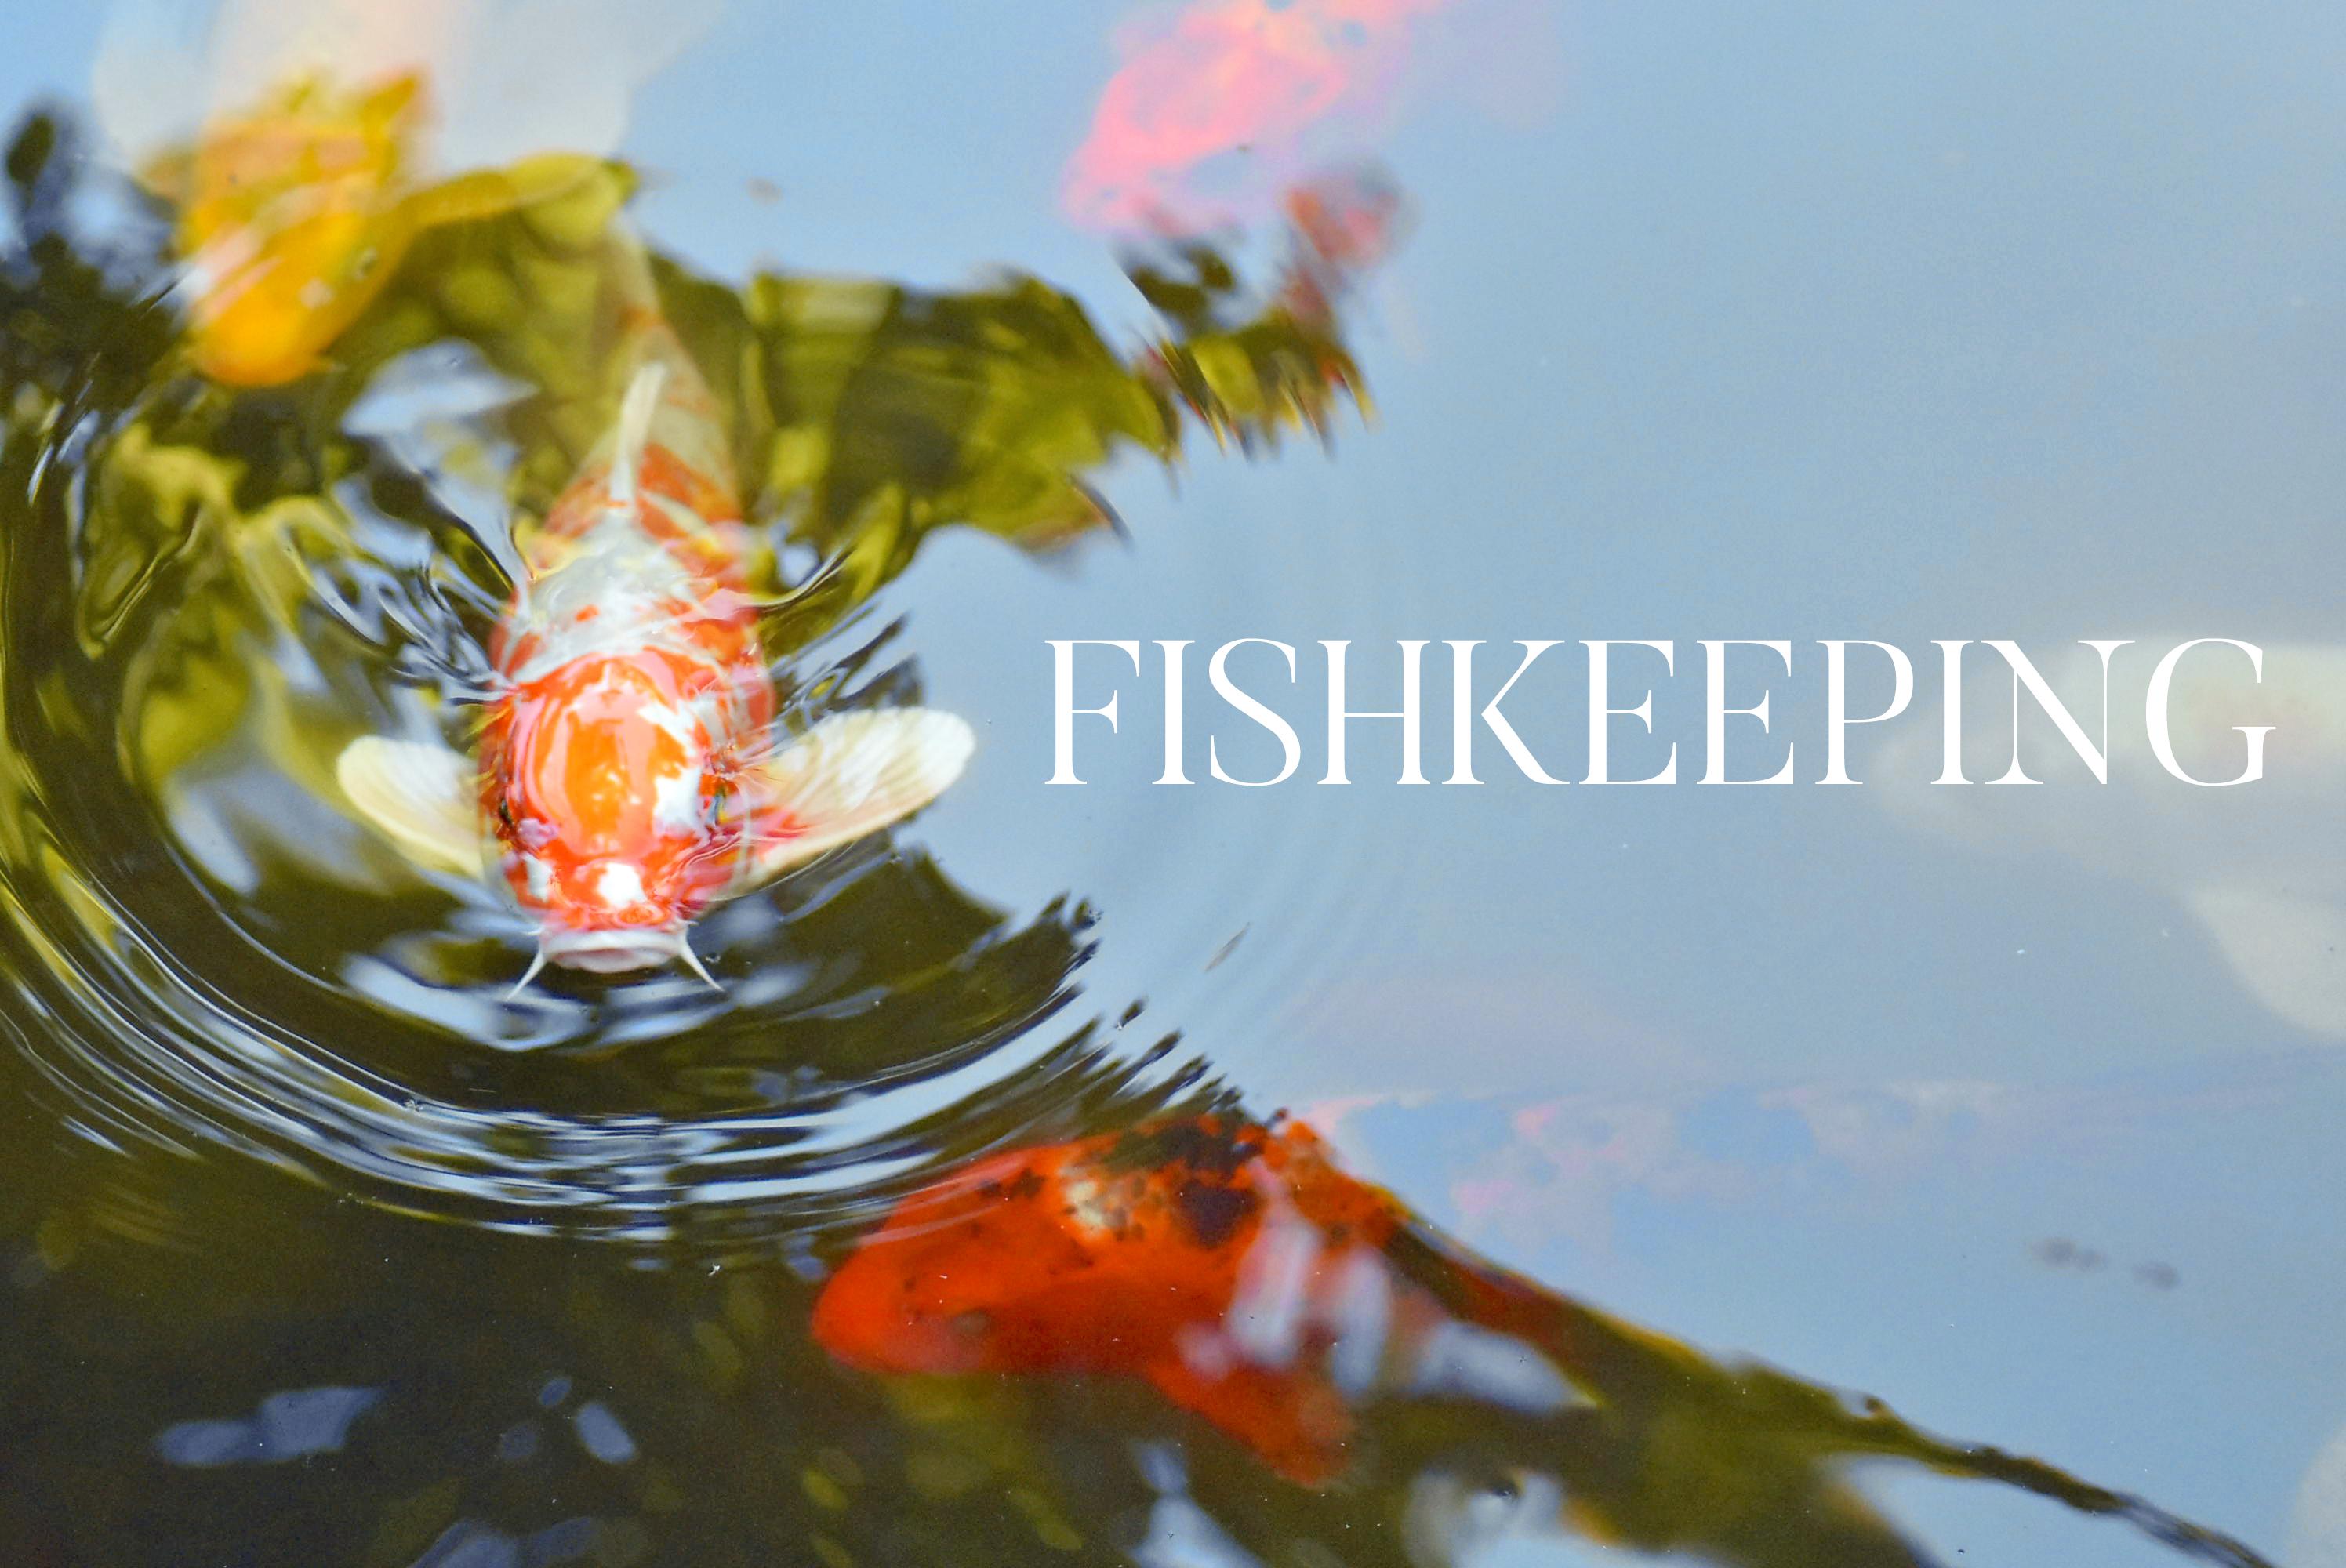 FISHKEEPING website image